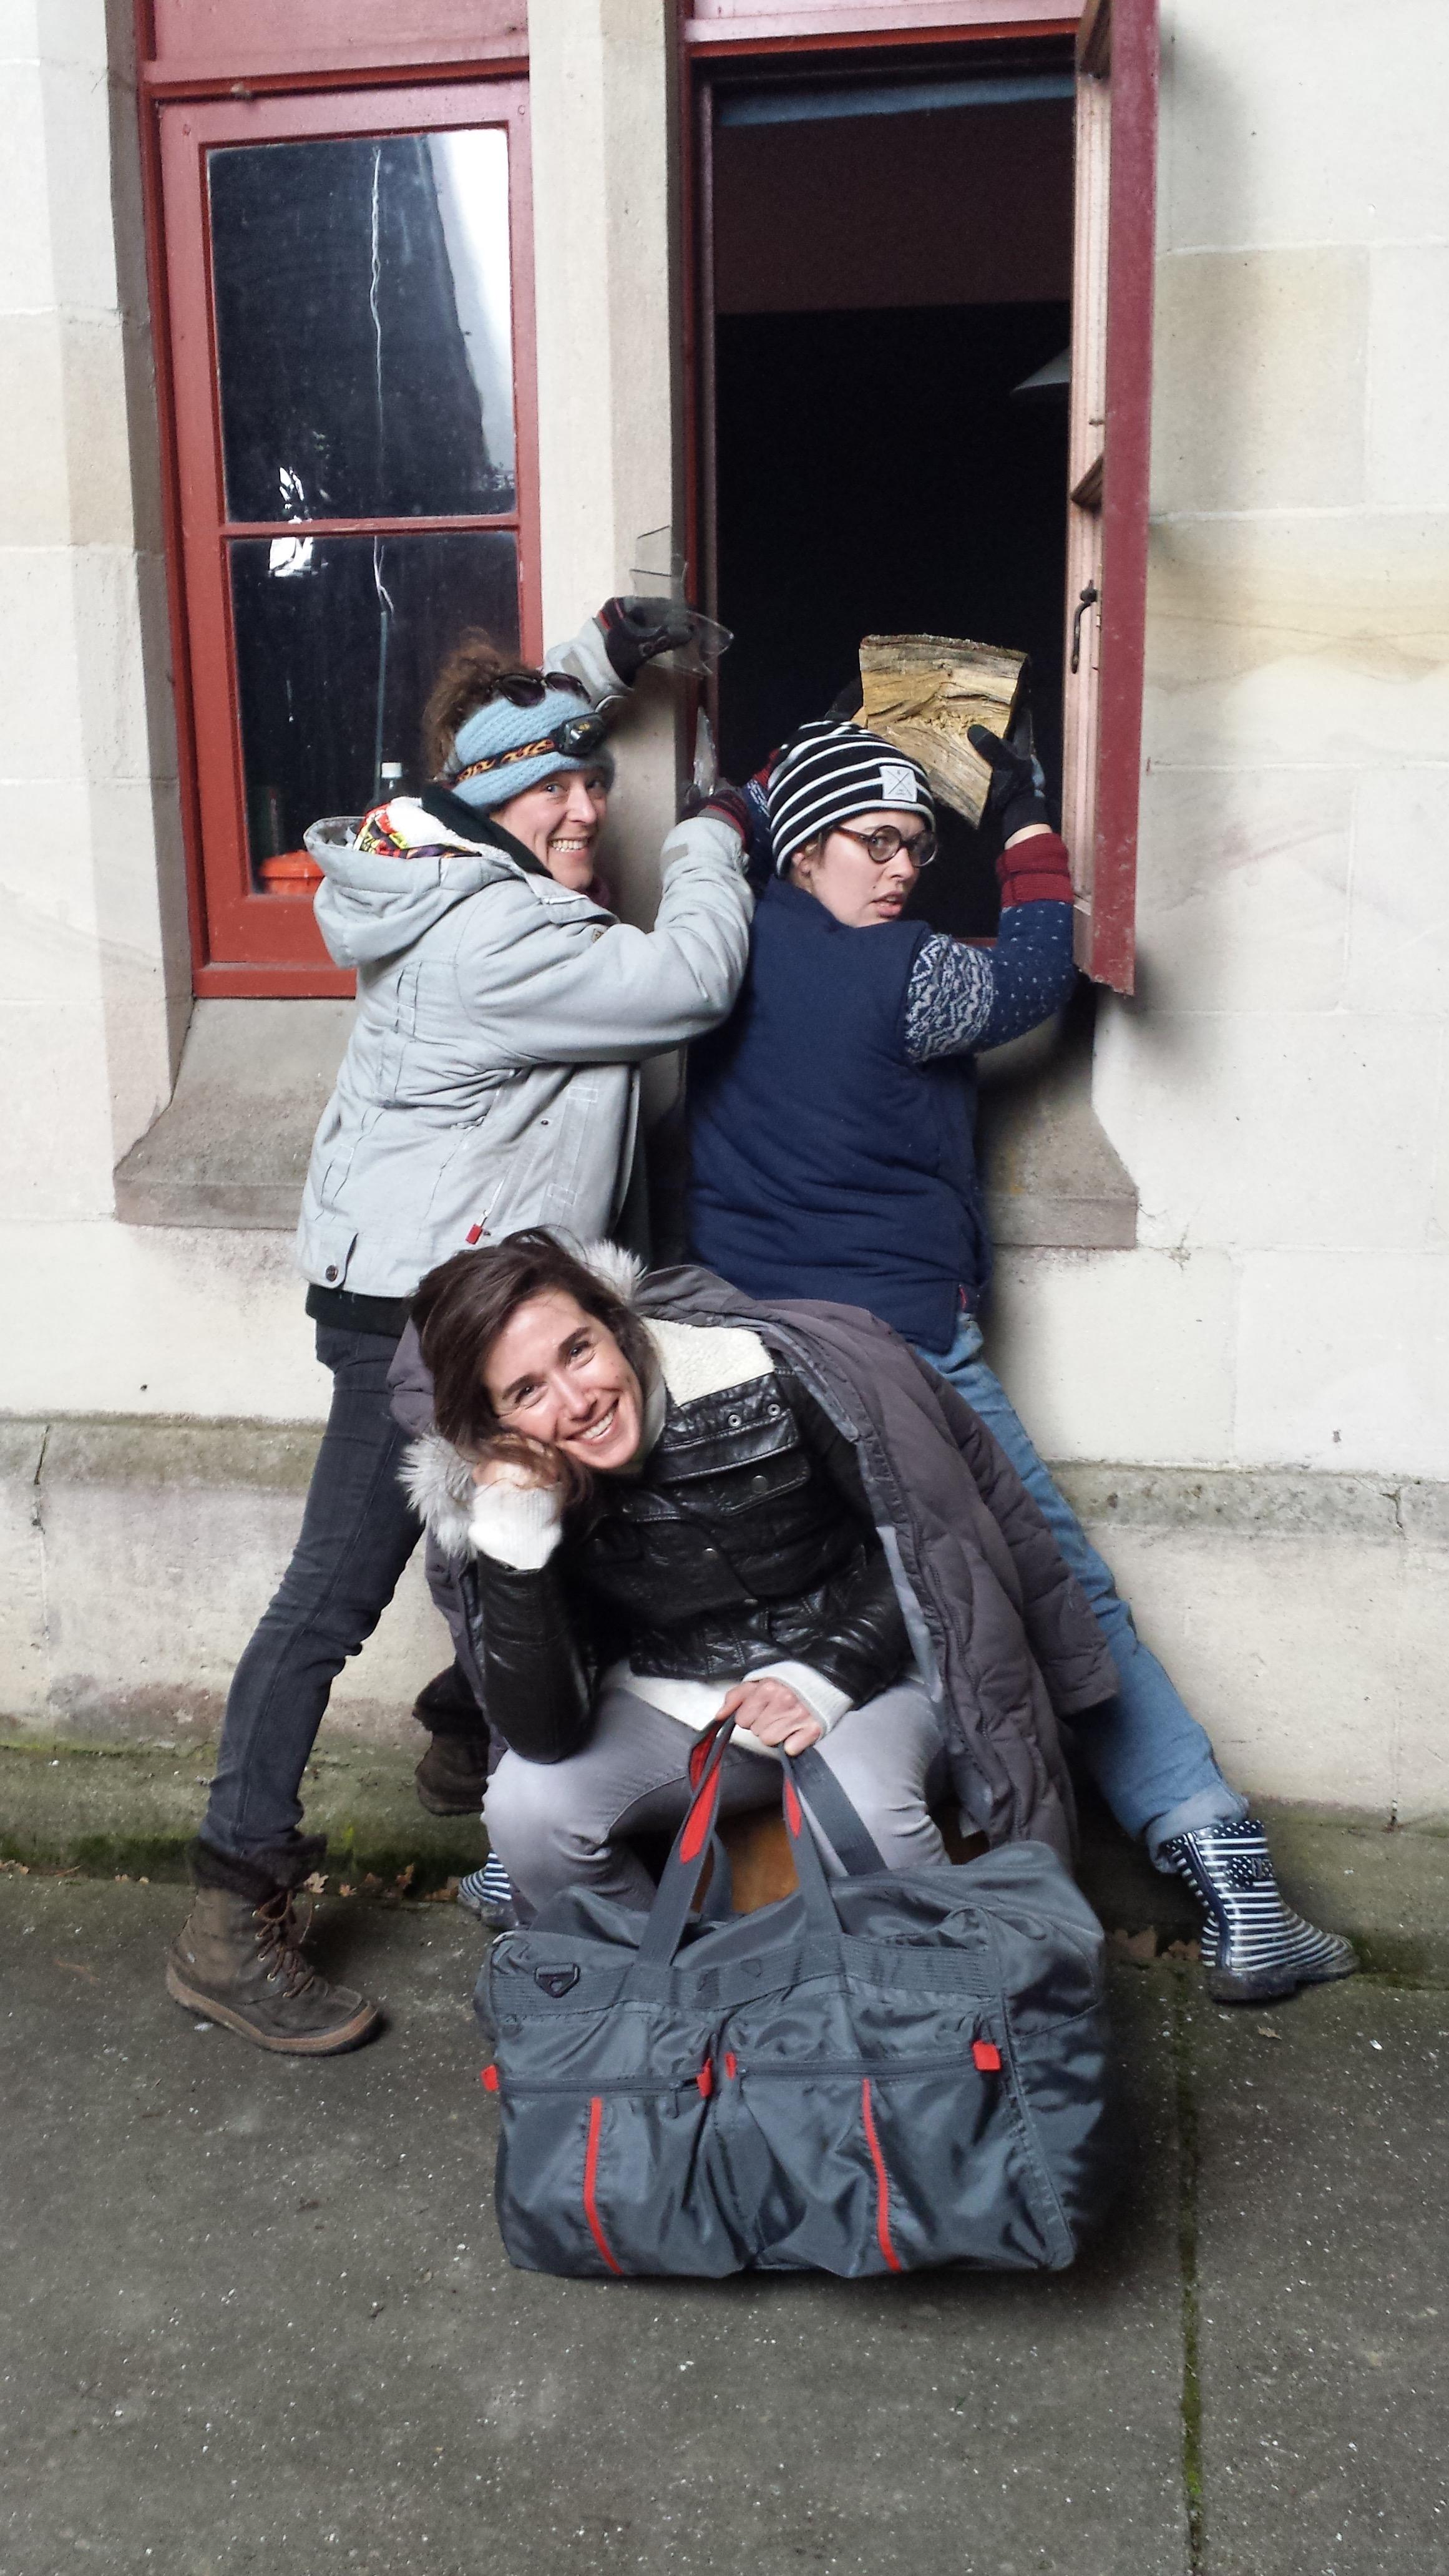 Actor Arta Dobroshi, Art Director Sophie Janus, Production Designer Sophie Durham